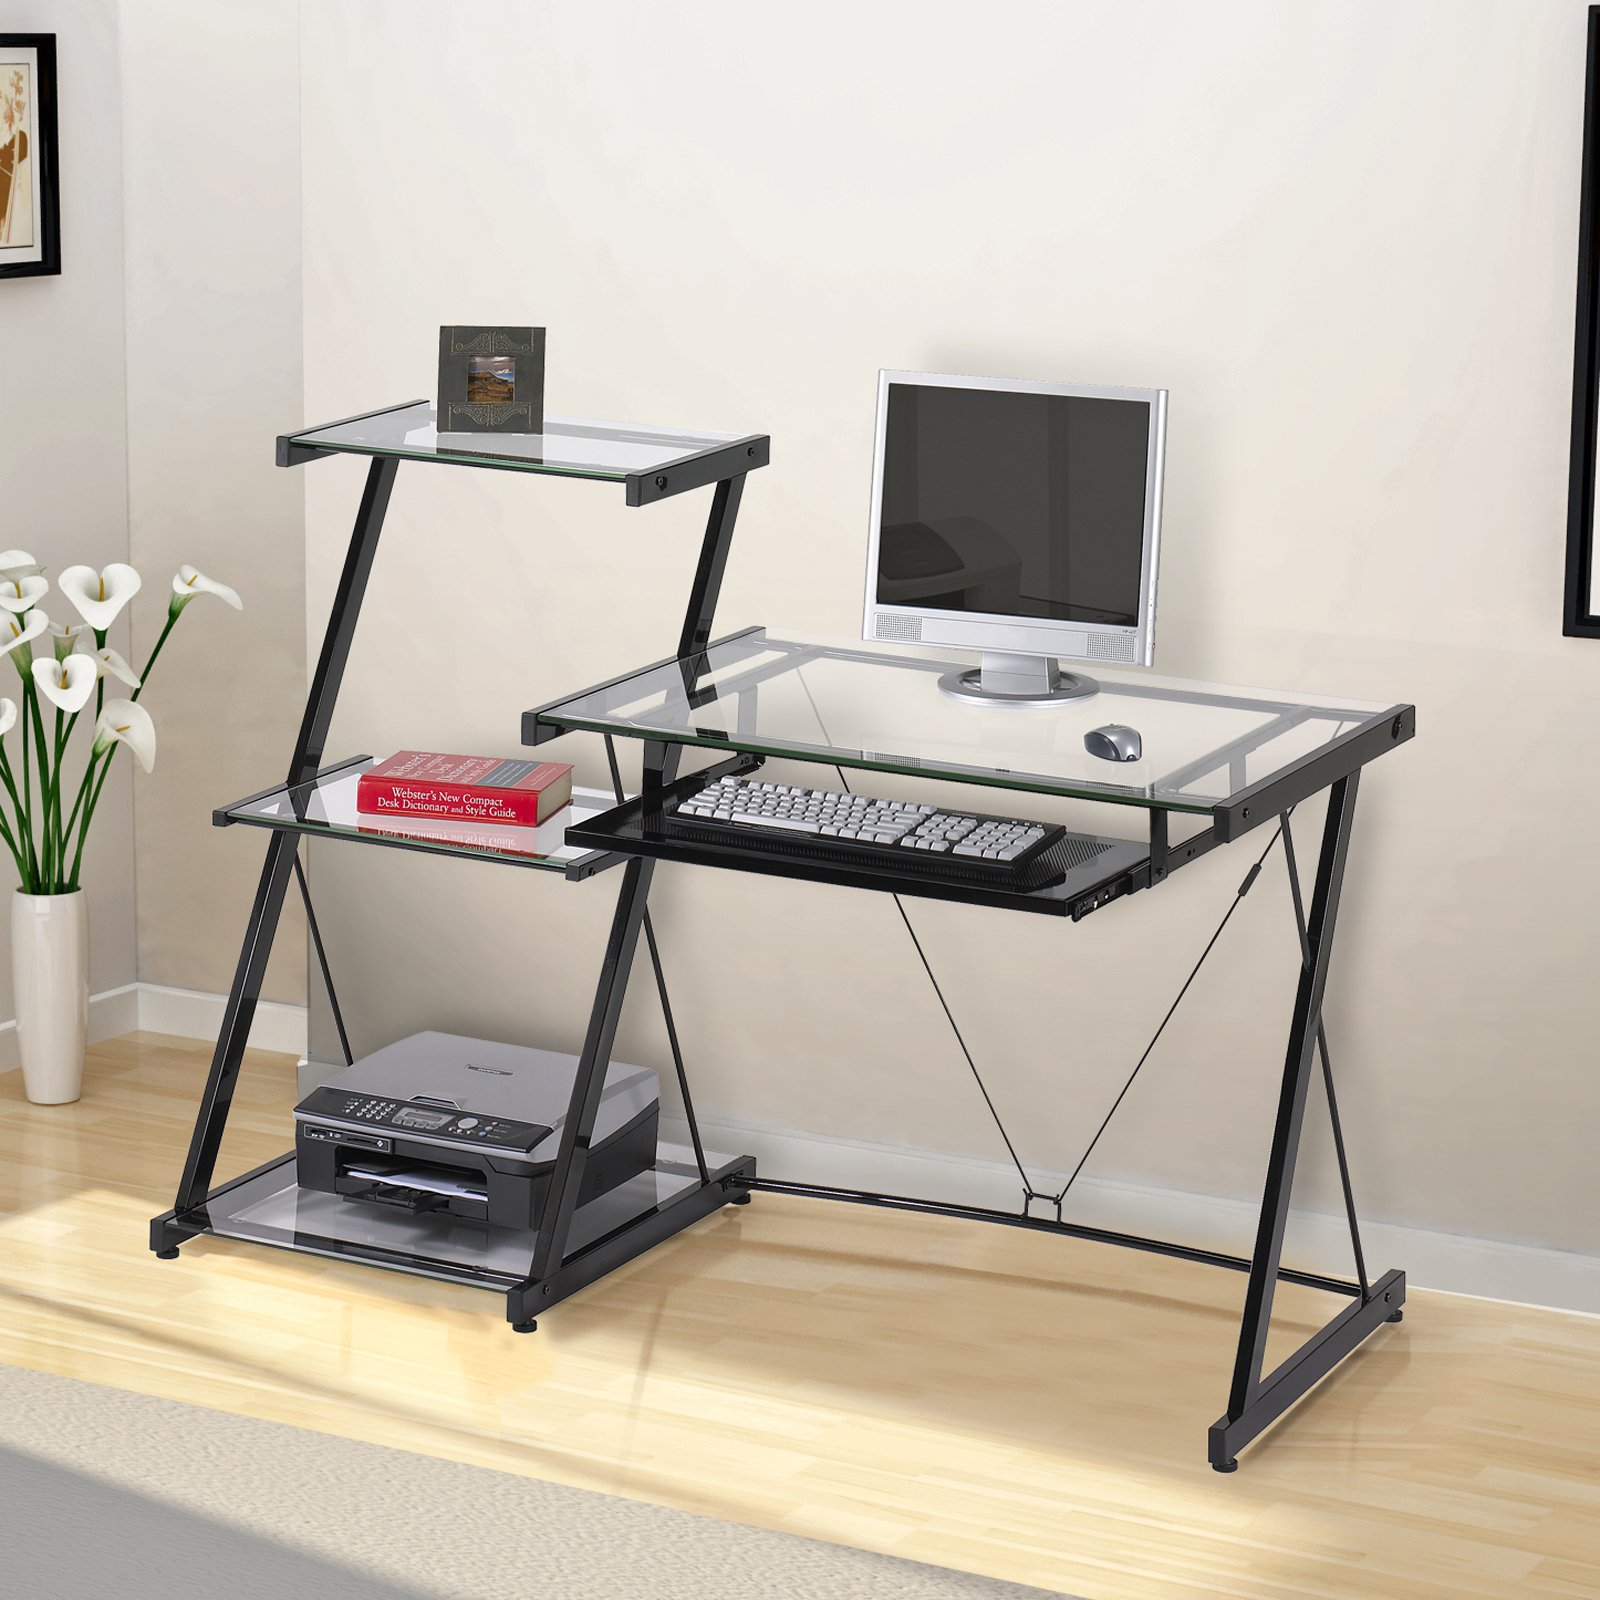 Zline Desks Desk Design Ideas